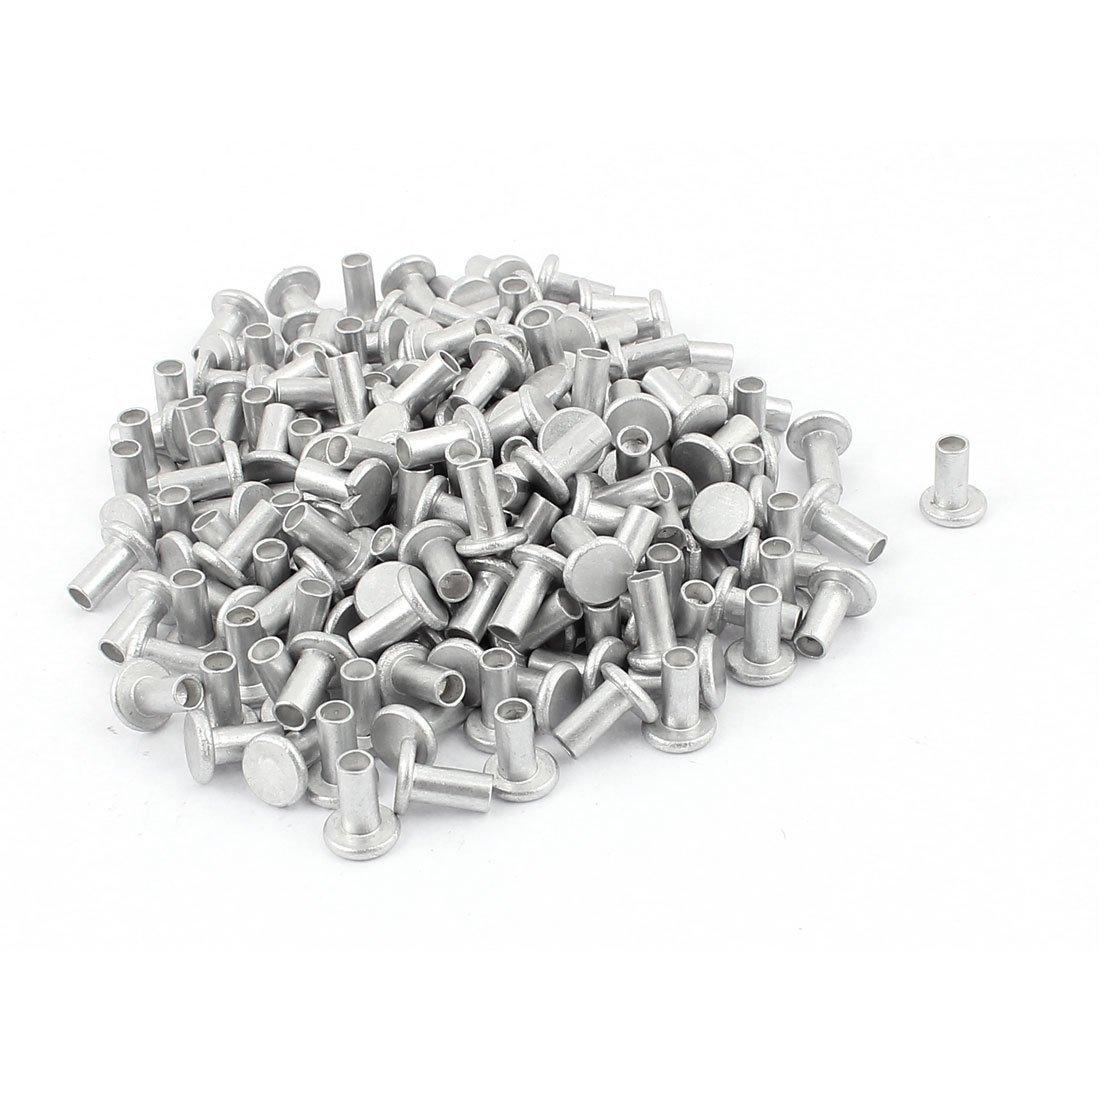 U-nique 50 Pcs 13//64 x 1 25//32 Nickel Plated Oval Head Semi-Tubular Rivets Silver Tone